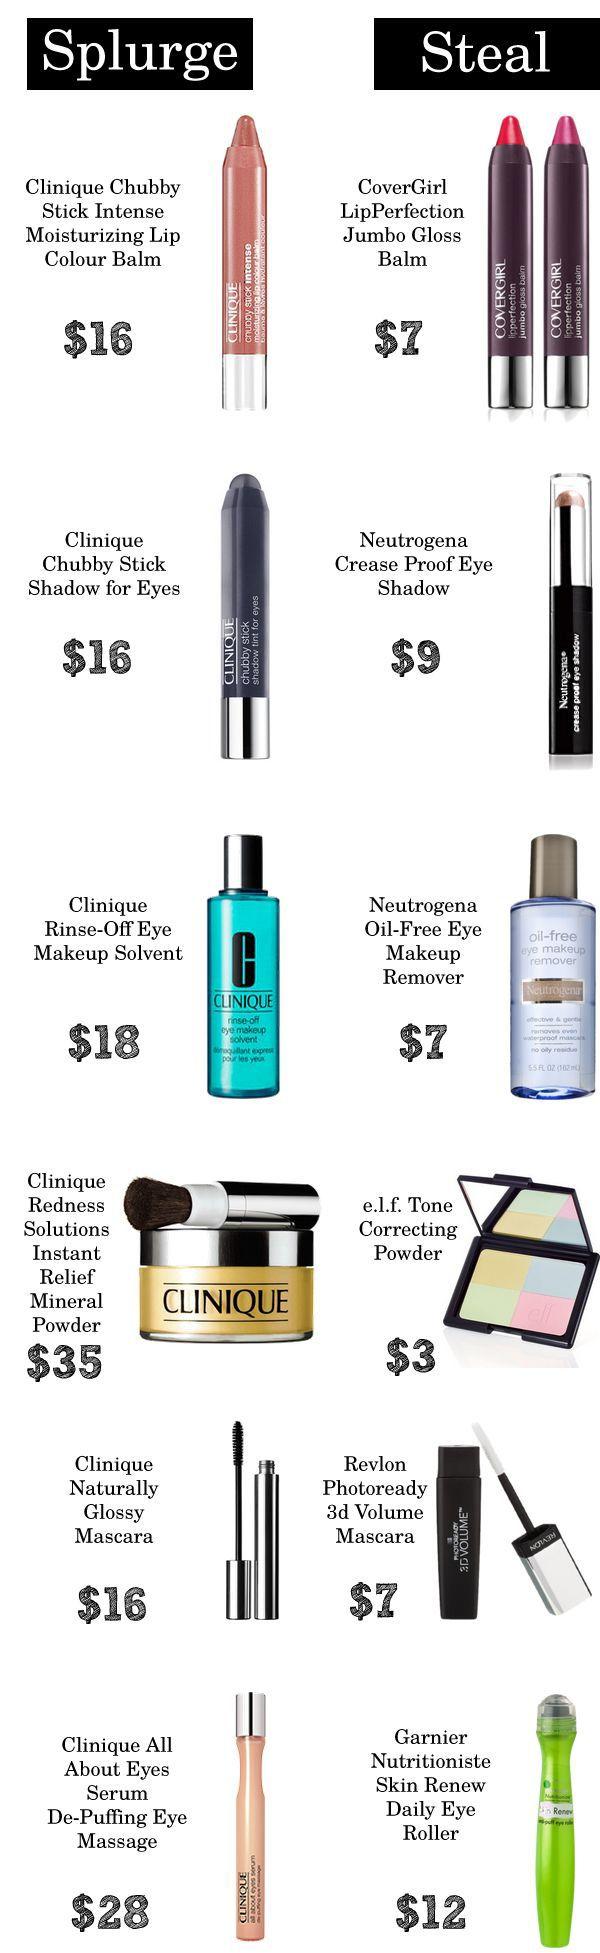 Splurge vs. Steal: 20 Amazing Beauty Dupes According To Pinterest  Read more: http://www.gurl.com/2014/05/01/splurge-vs-steal-makeup-beauty-dupes-nars-elf-mac-nyx/#ixzz3TqryAujC